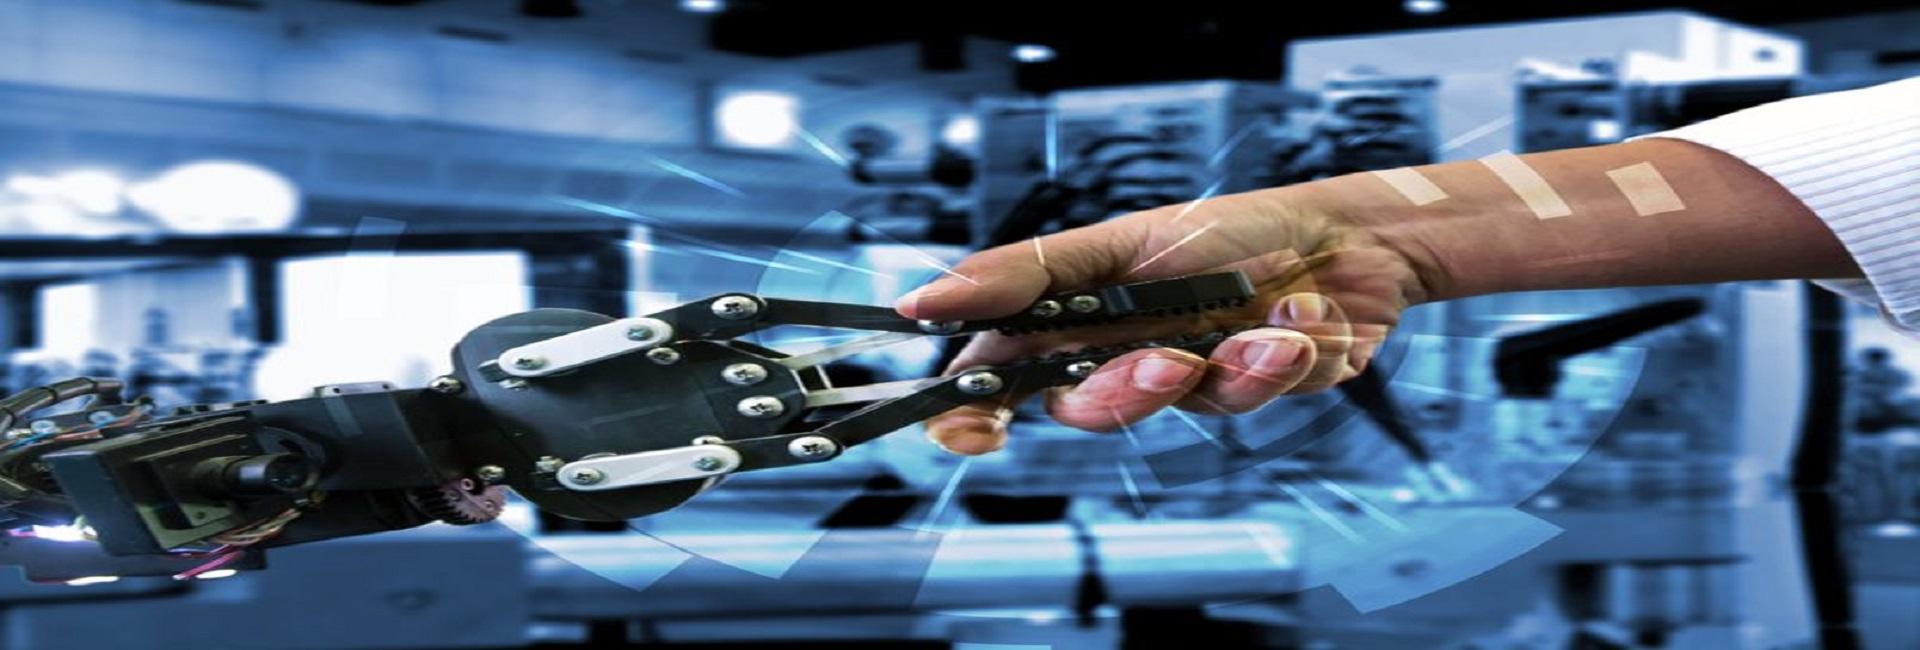 Cyberdyne – exosquelette intelligent